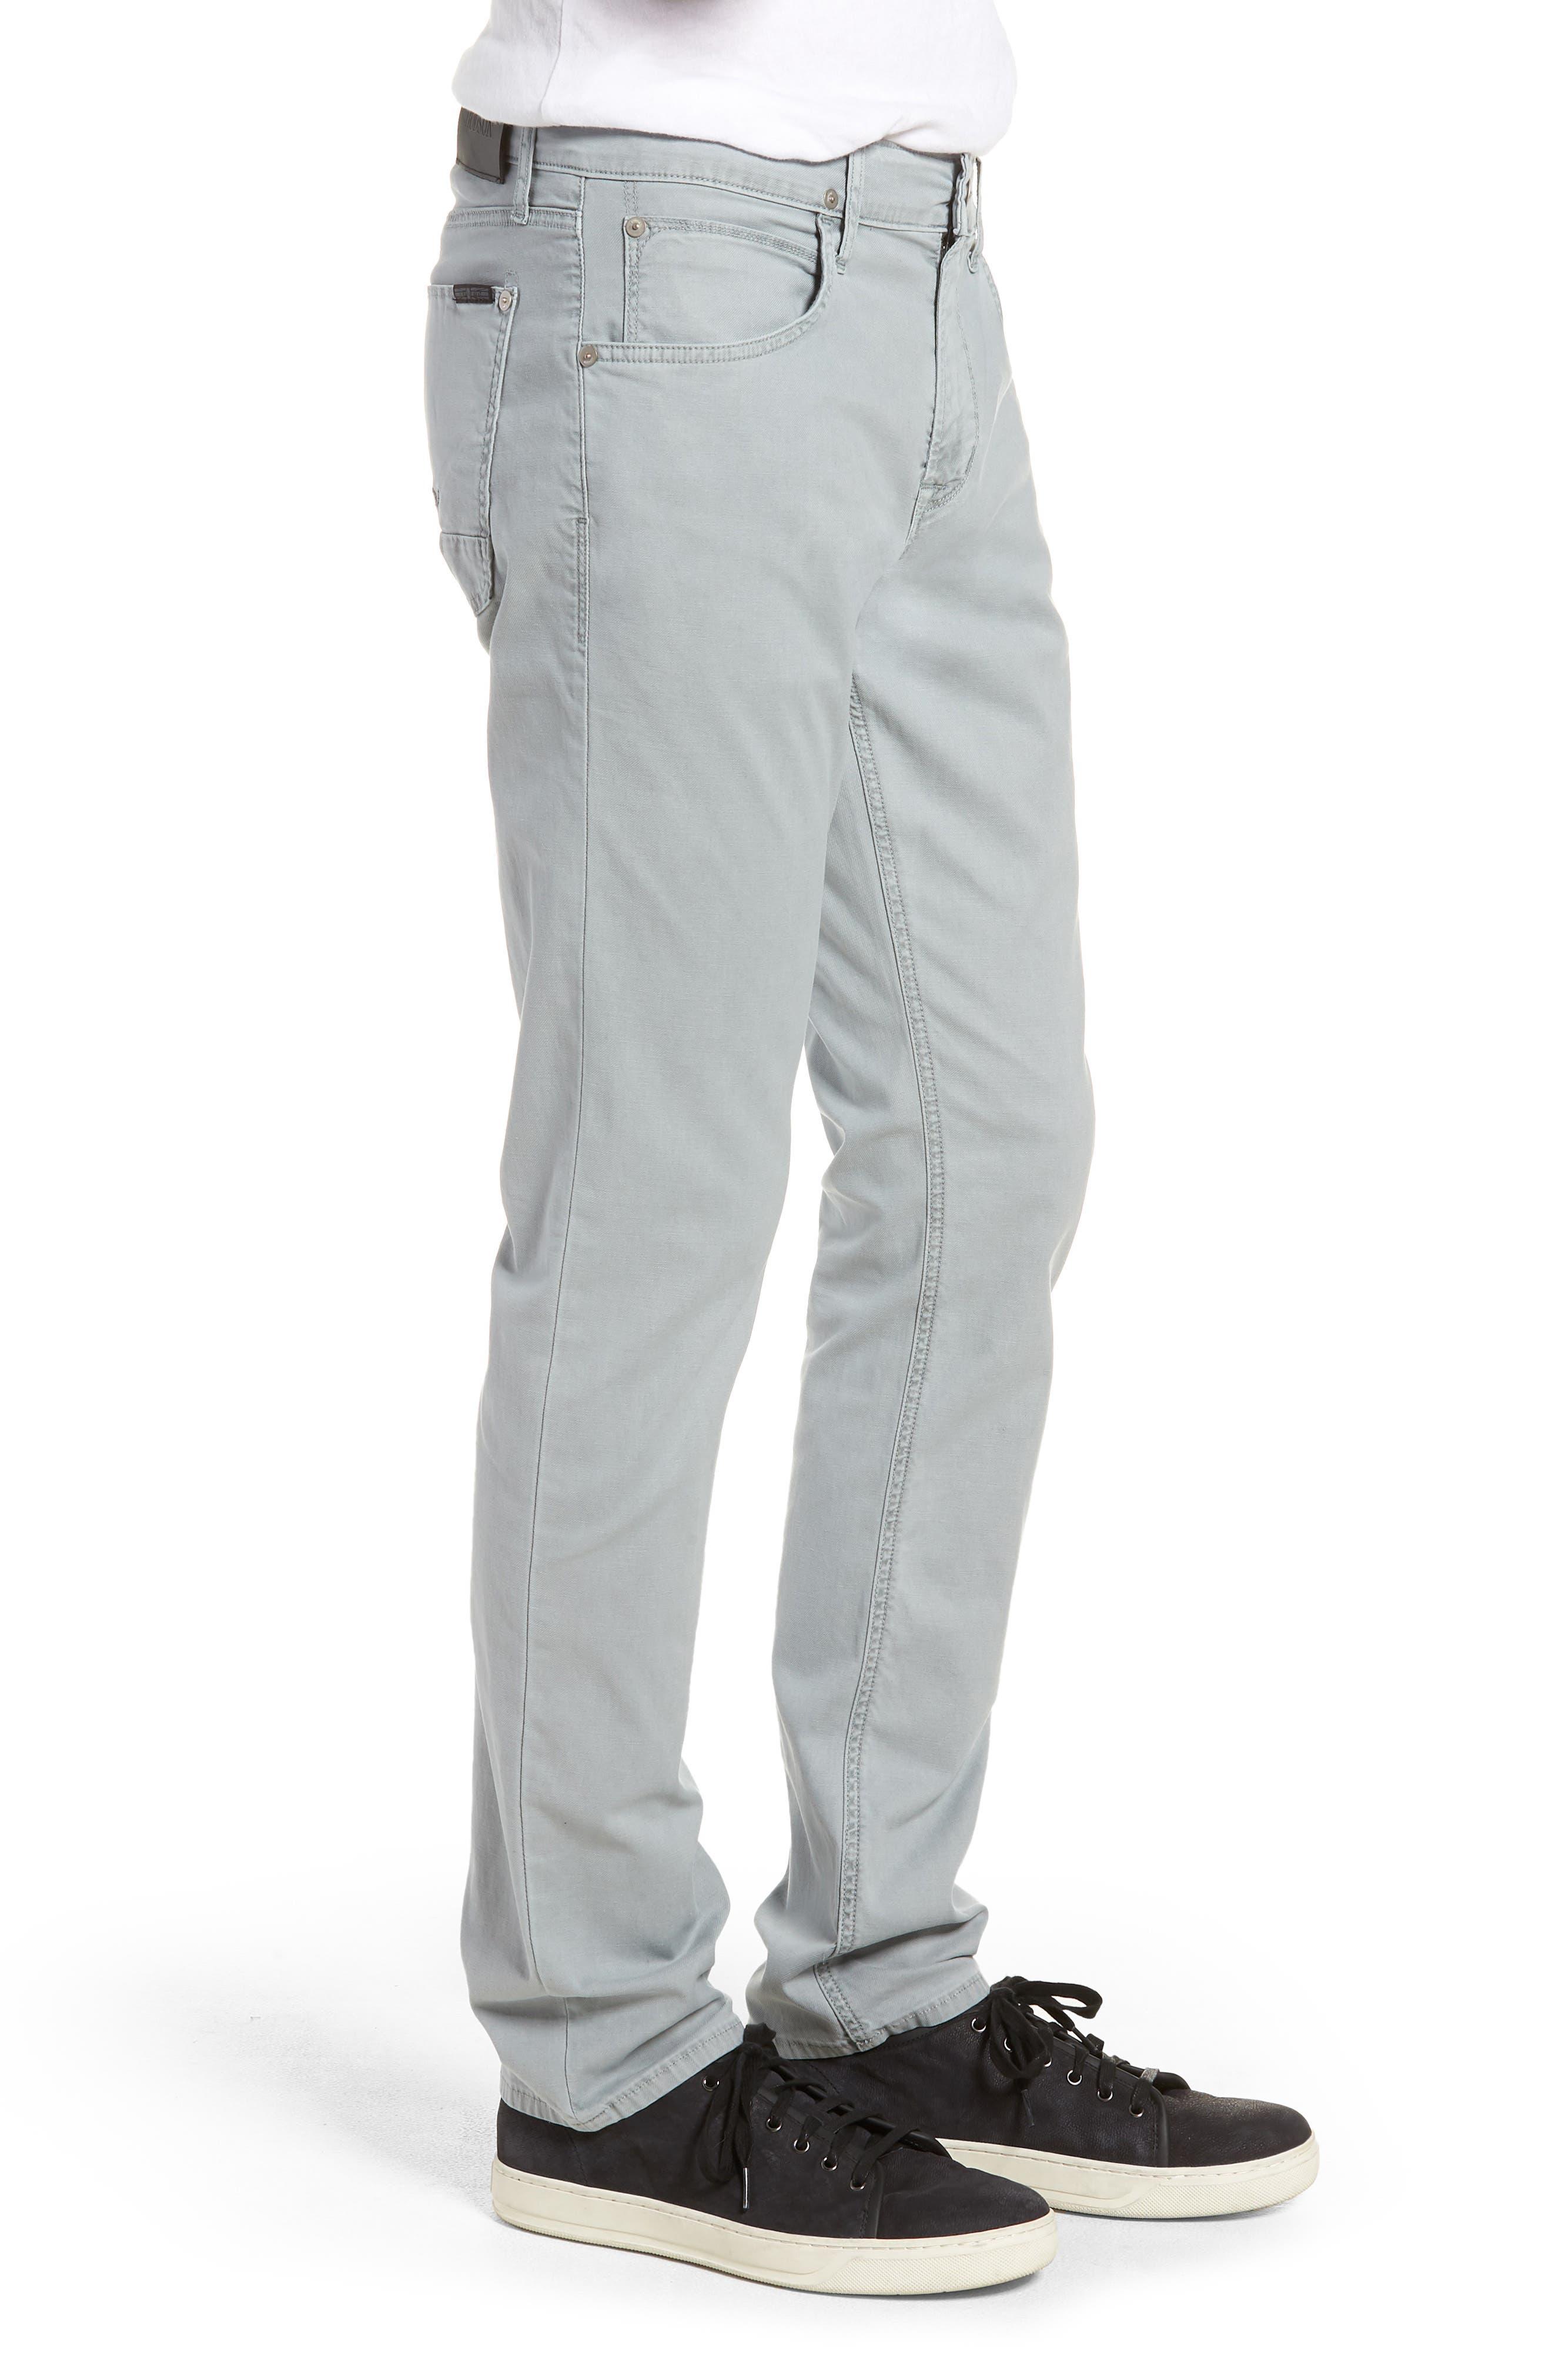 Blake Slim Fit Jeans,                             Alternate thumbnail 3, color,                             Steel Blue